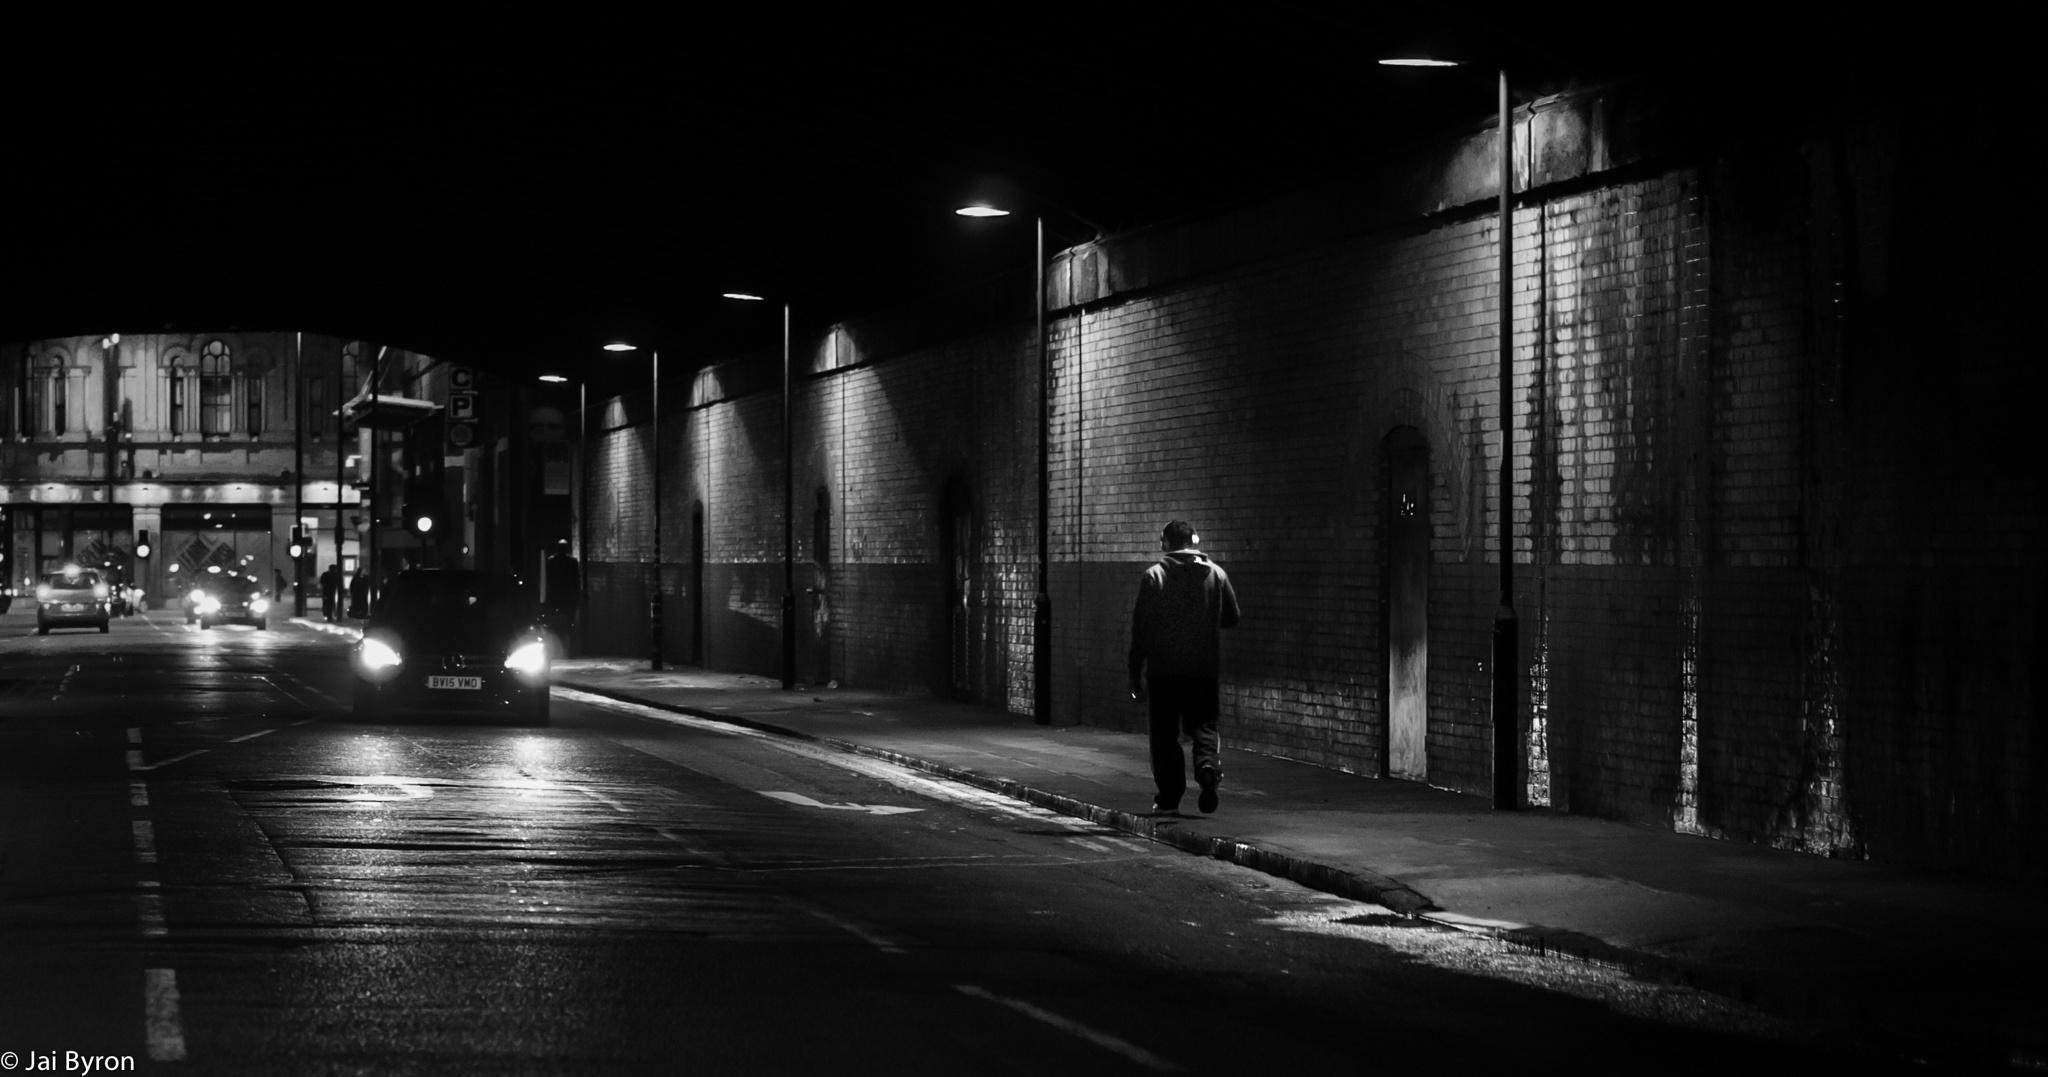 Night Beat by Jai Byron